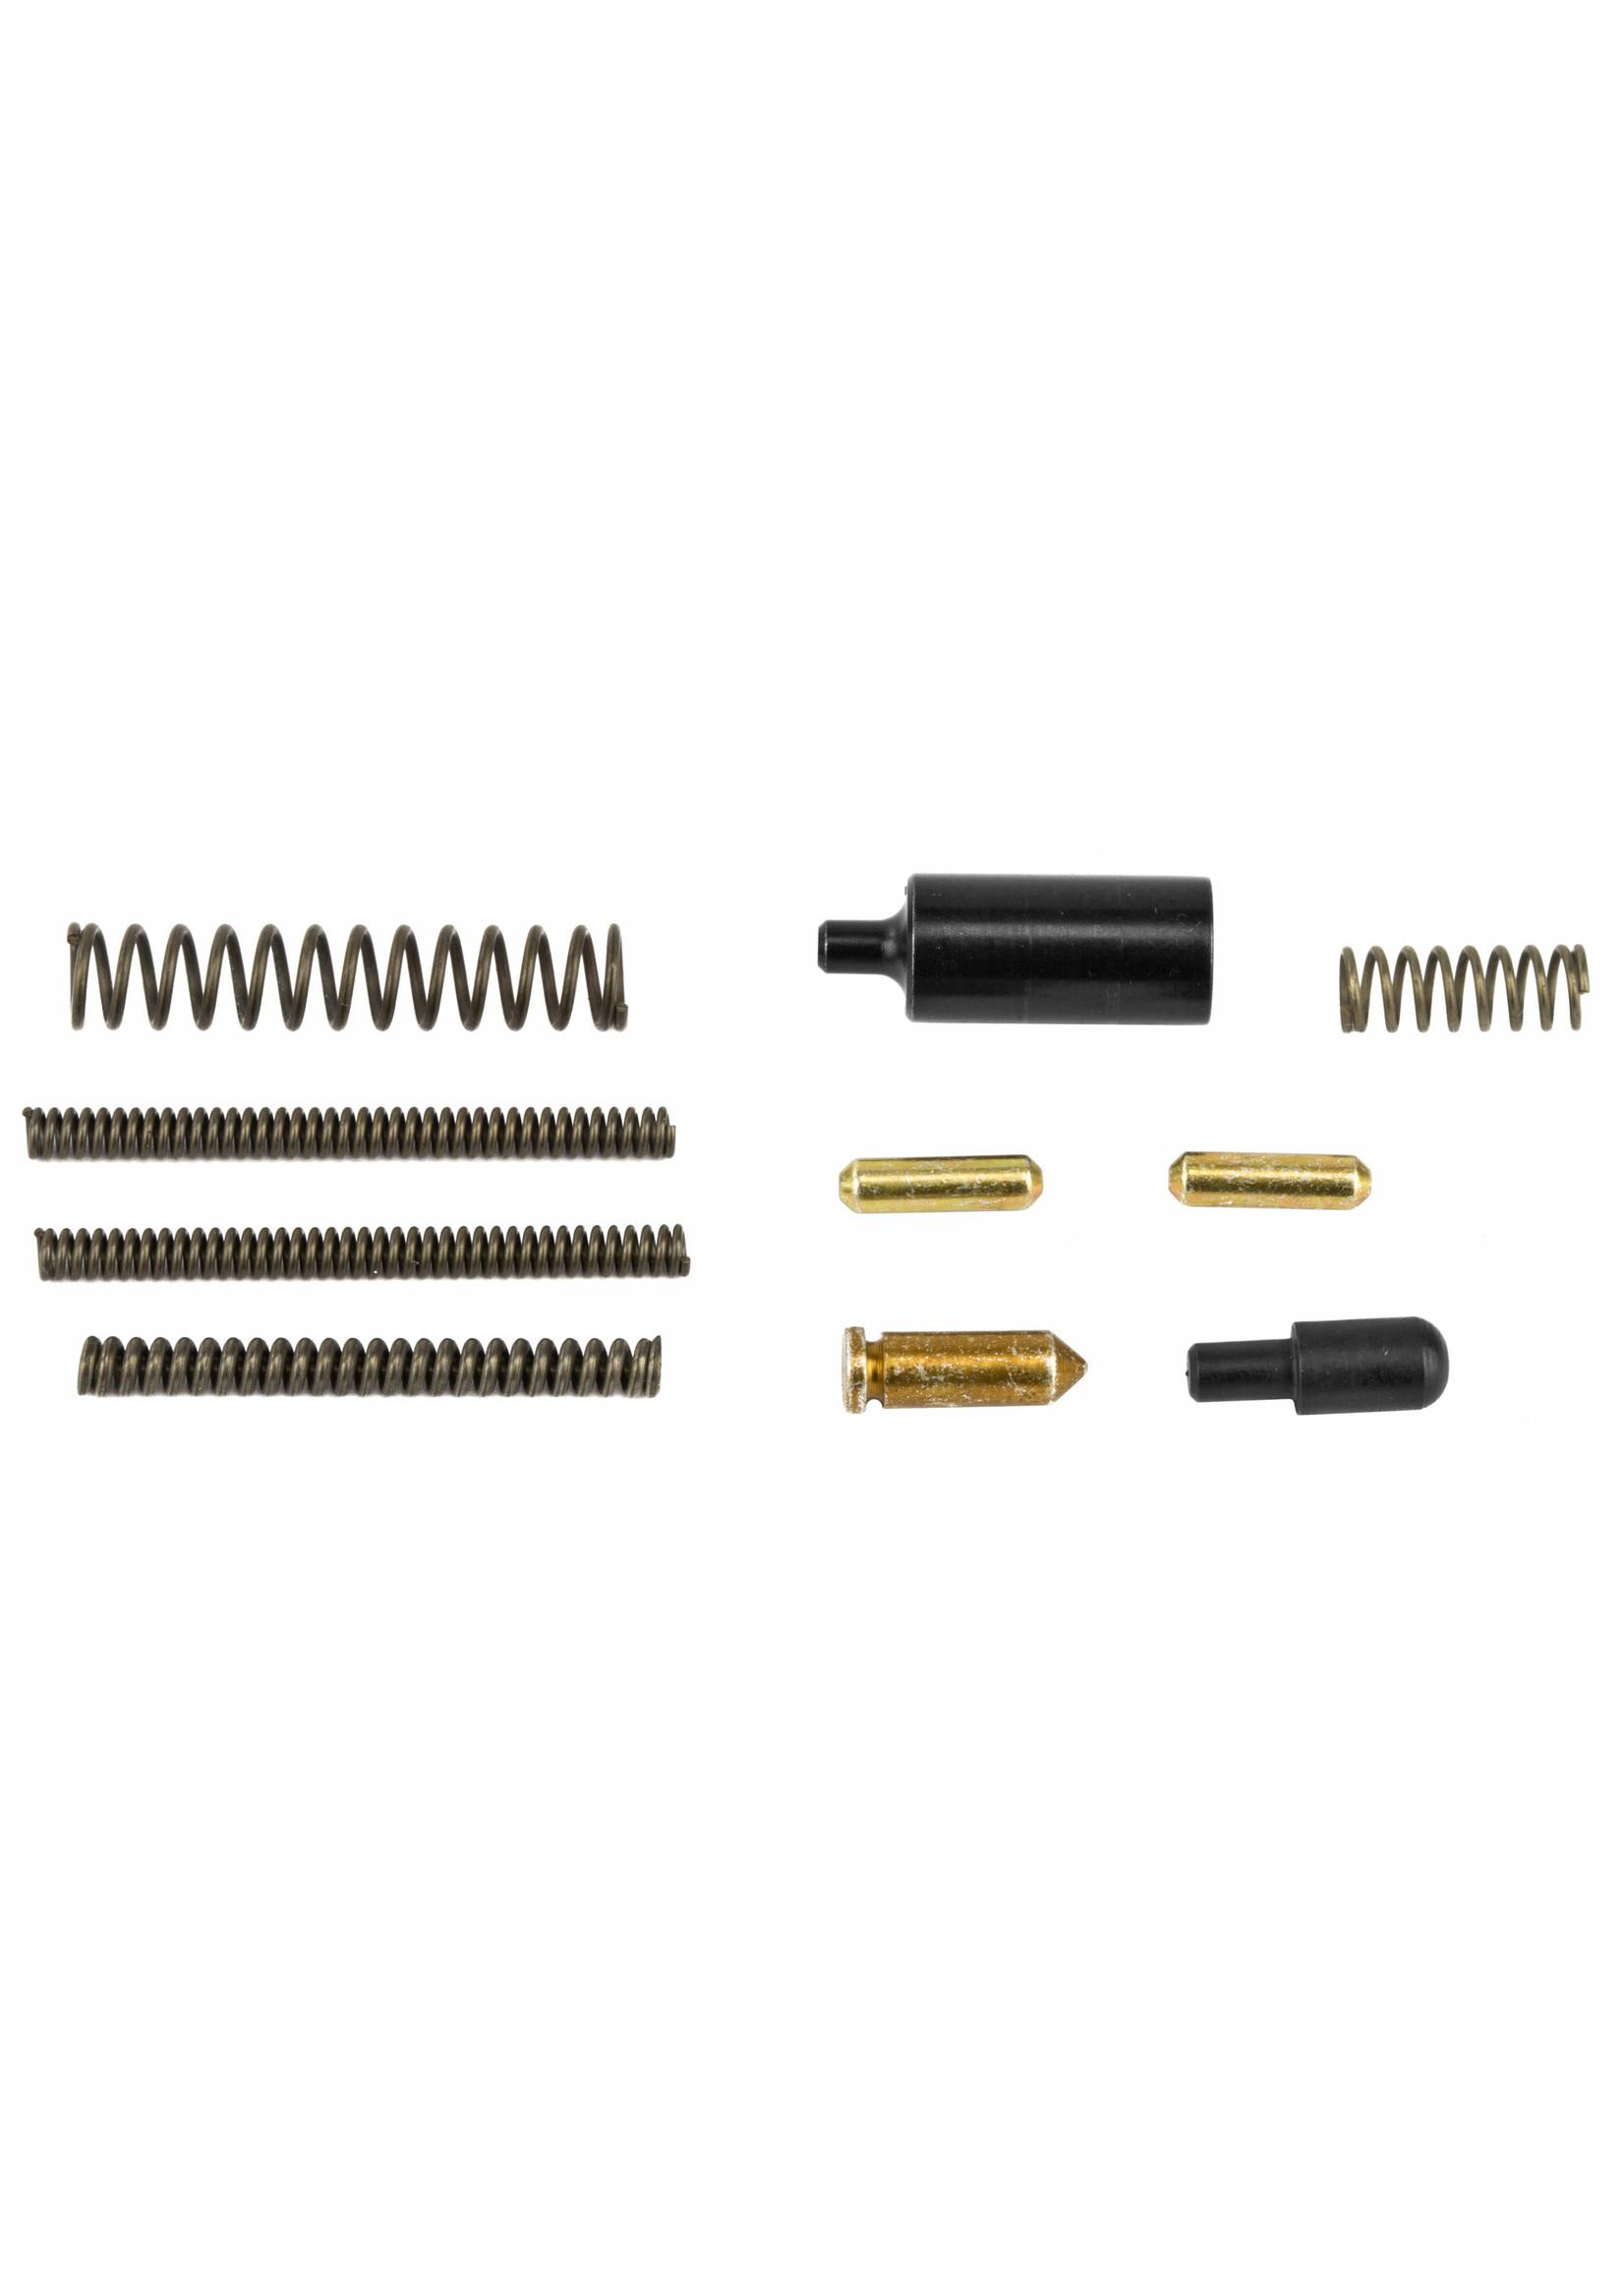 2A Armament 2A Armament Builders Series, AR15 Lower Parts, Spring/Detent Replacement Kit, Anodized Black Finish